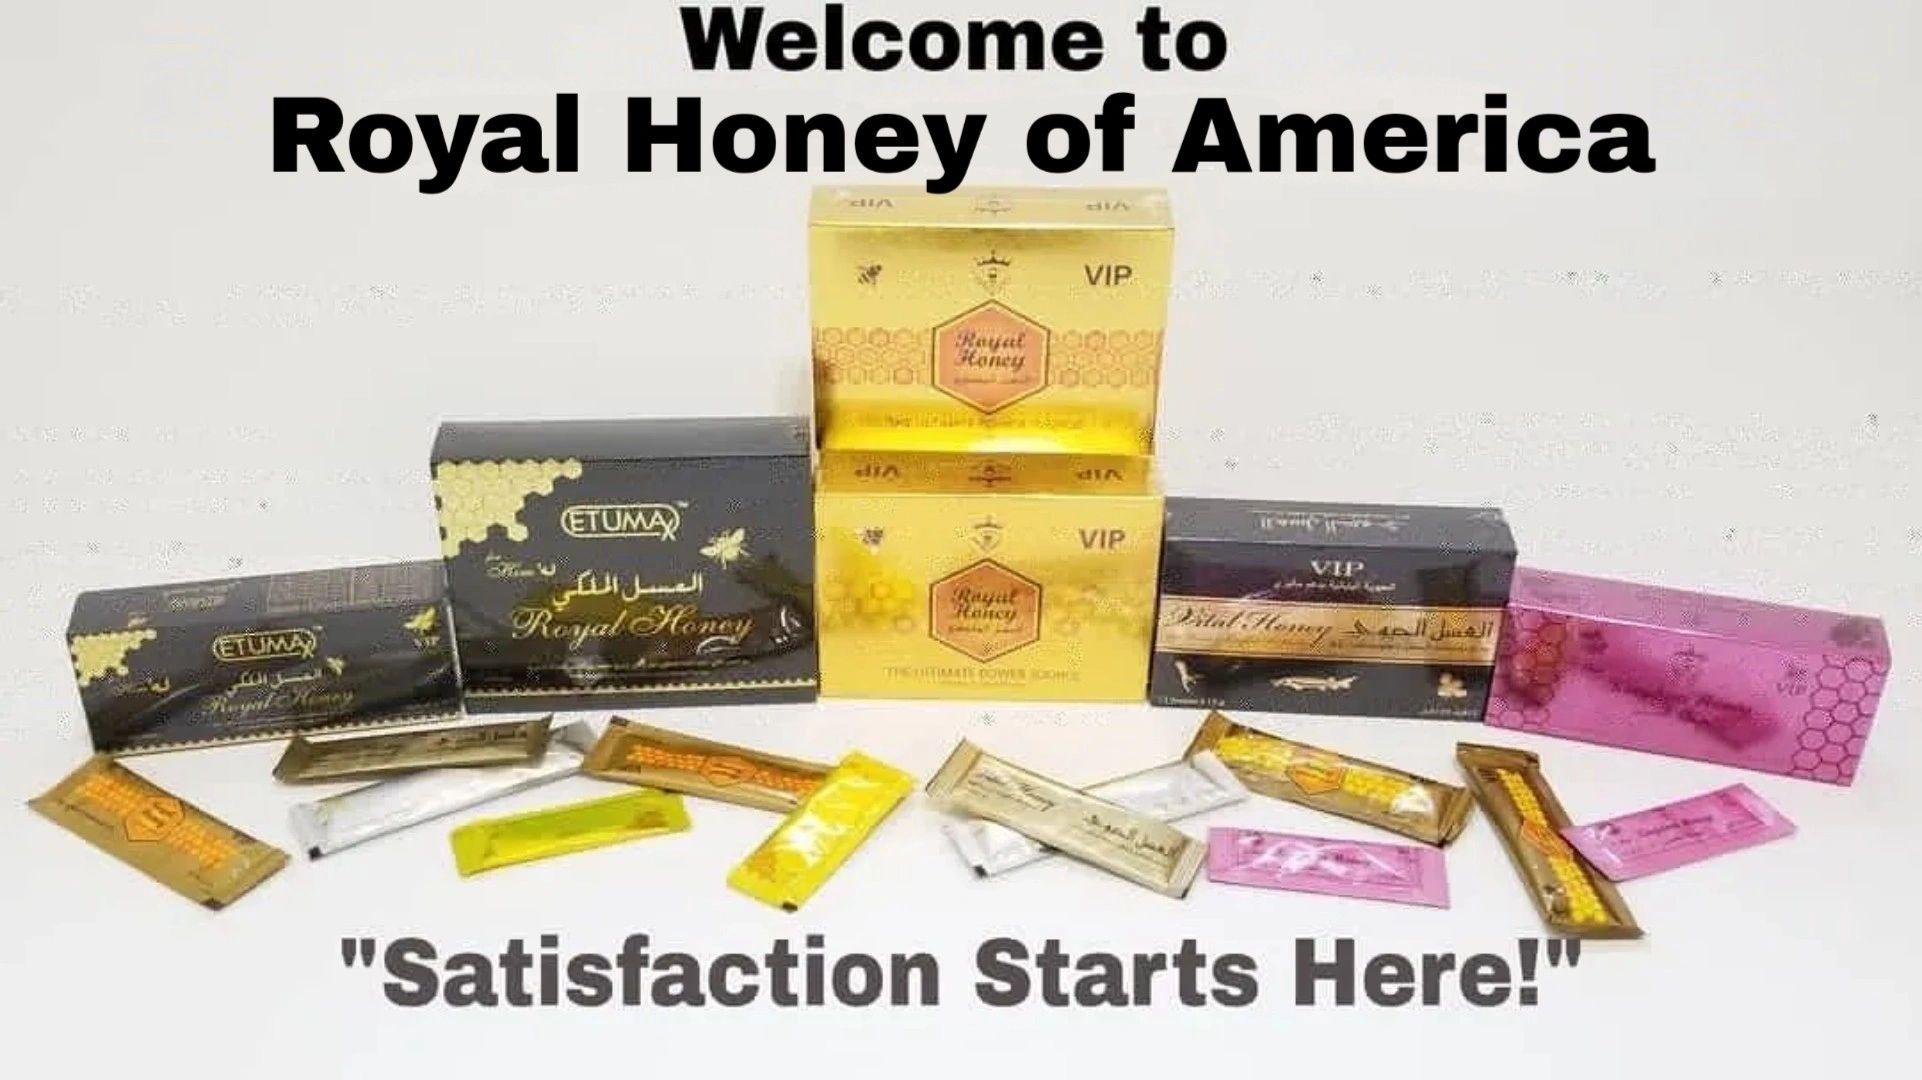 ROYAL HONEY Vip America usa Health, Vitamins and Supplements